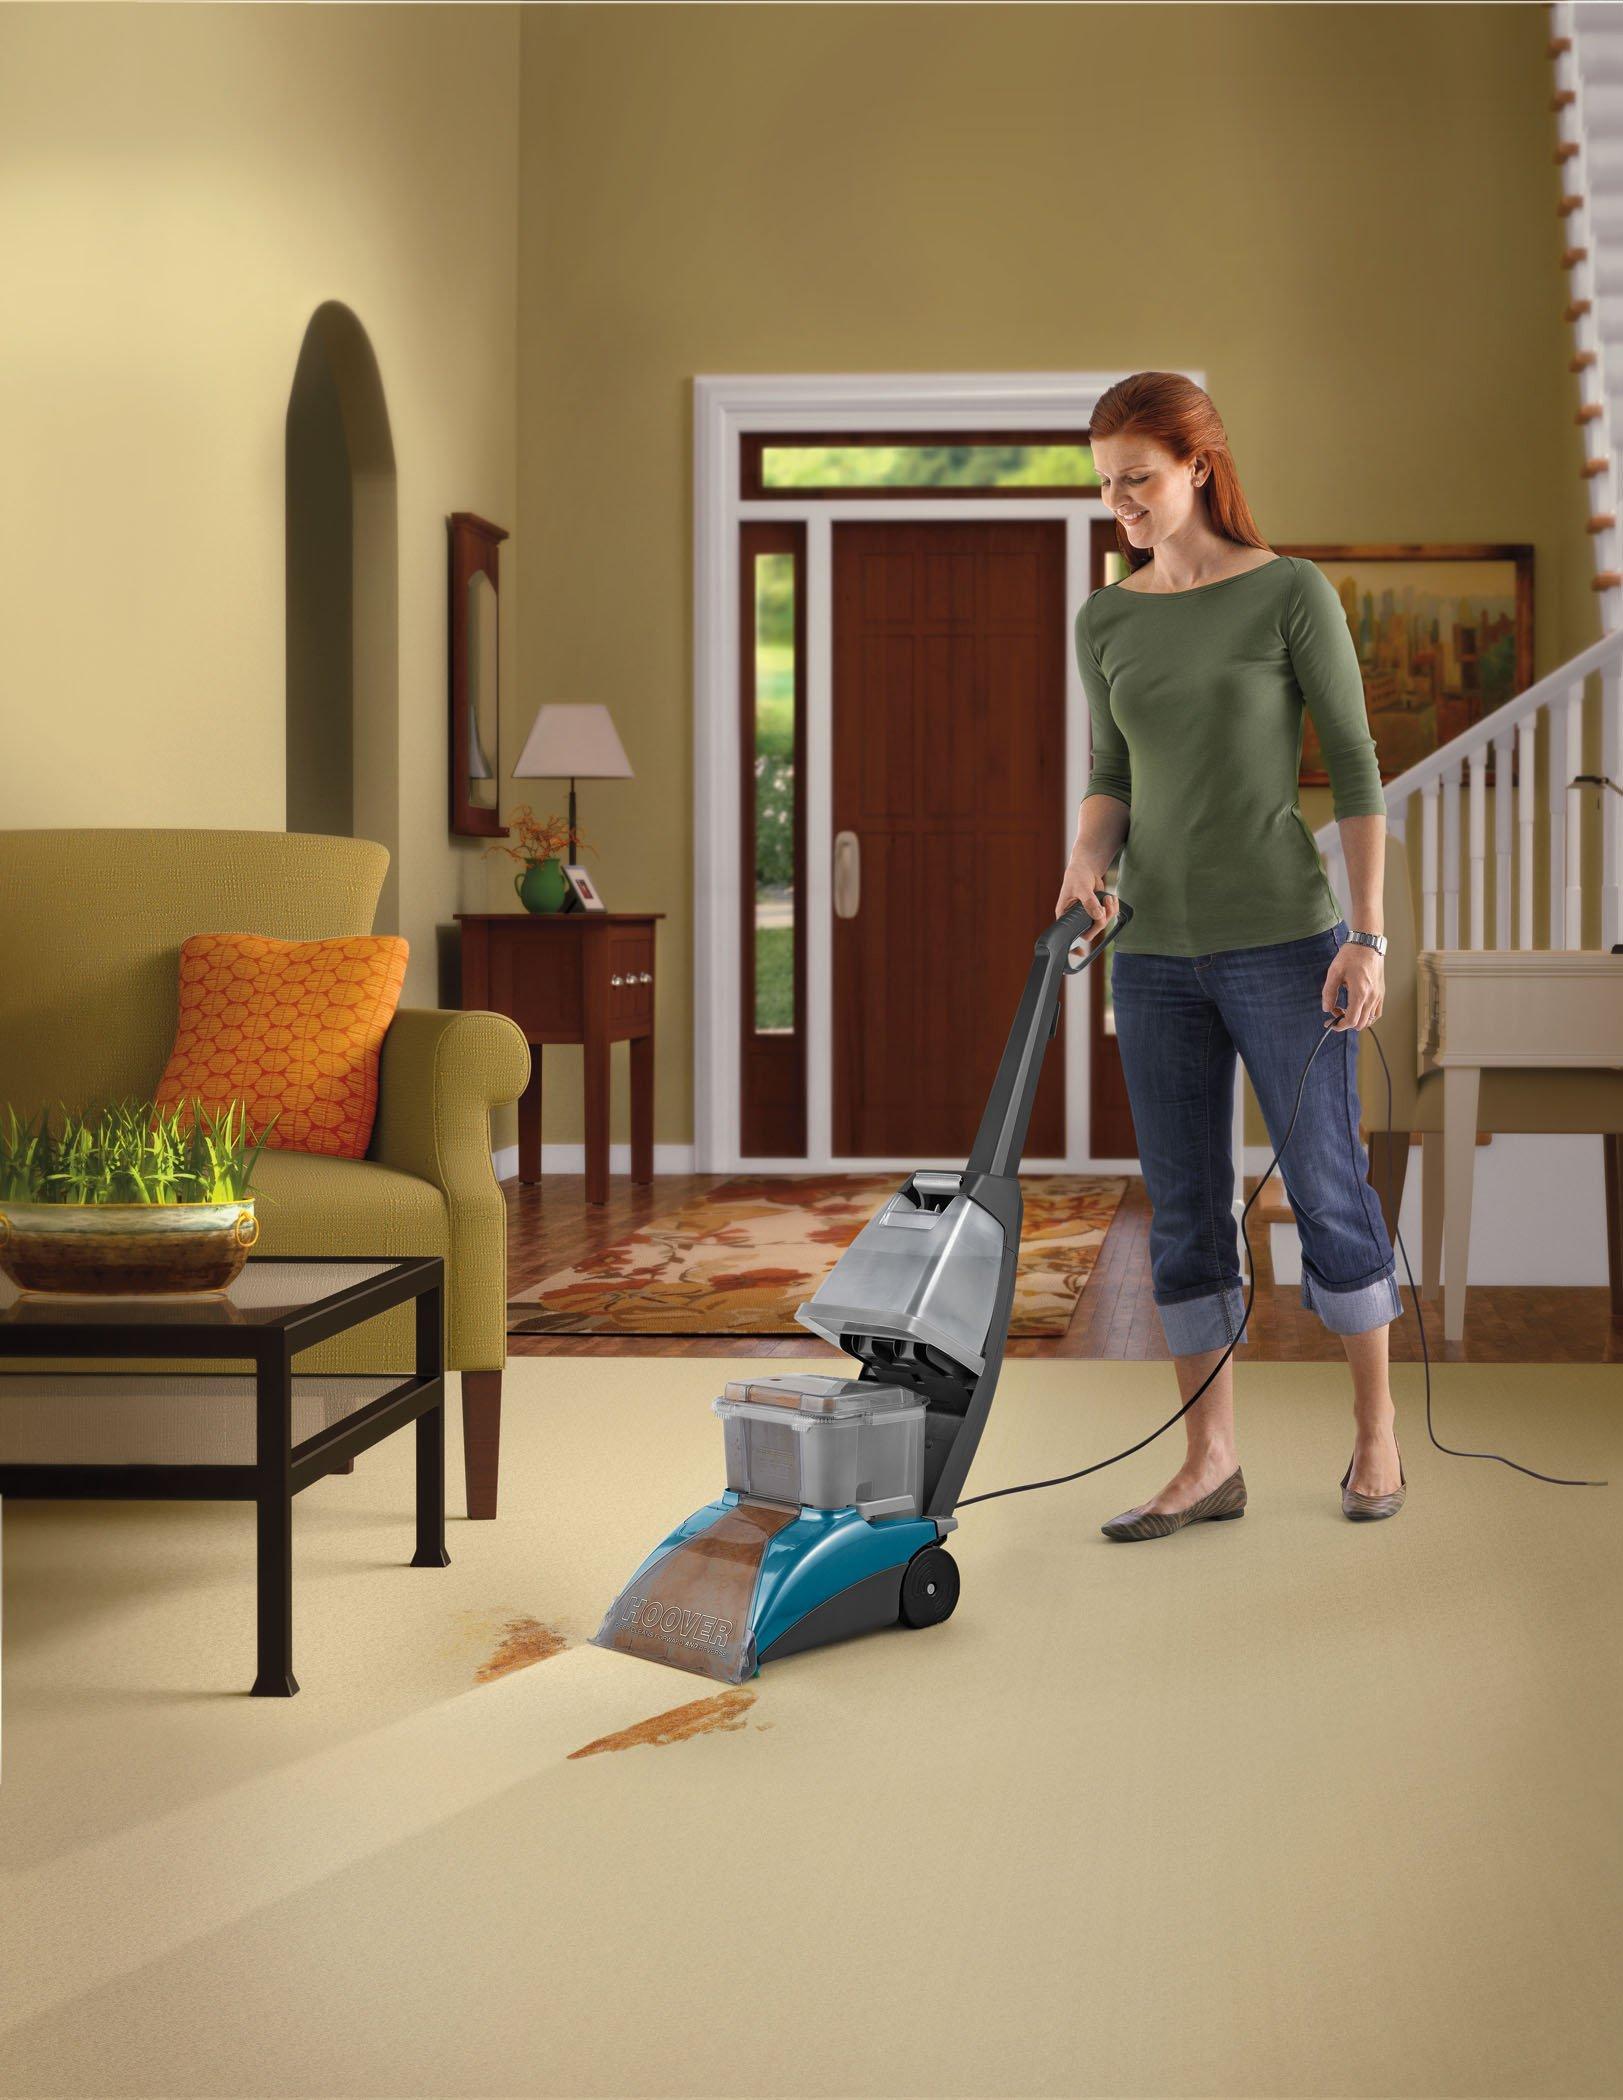 SteamVac Carpet Cleaner3